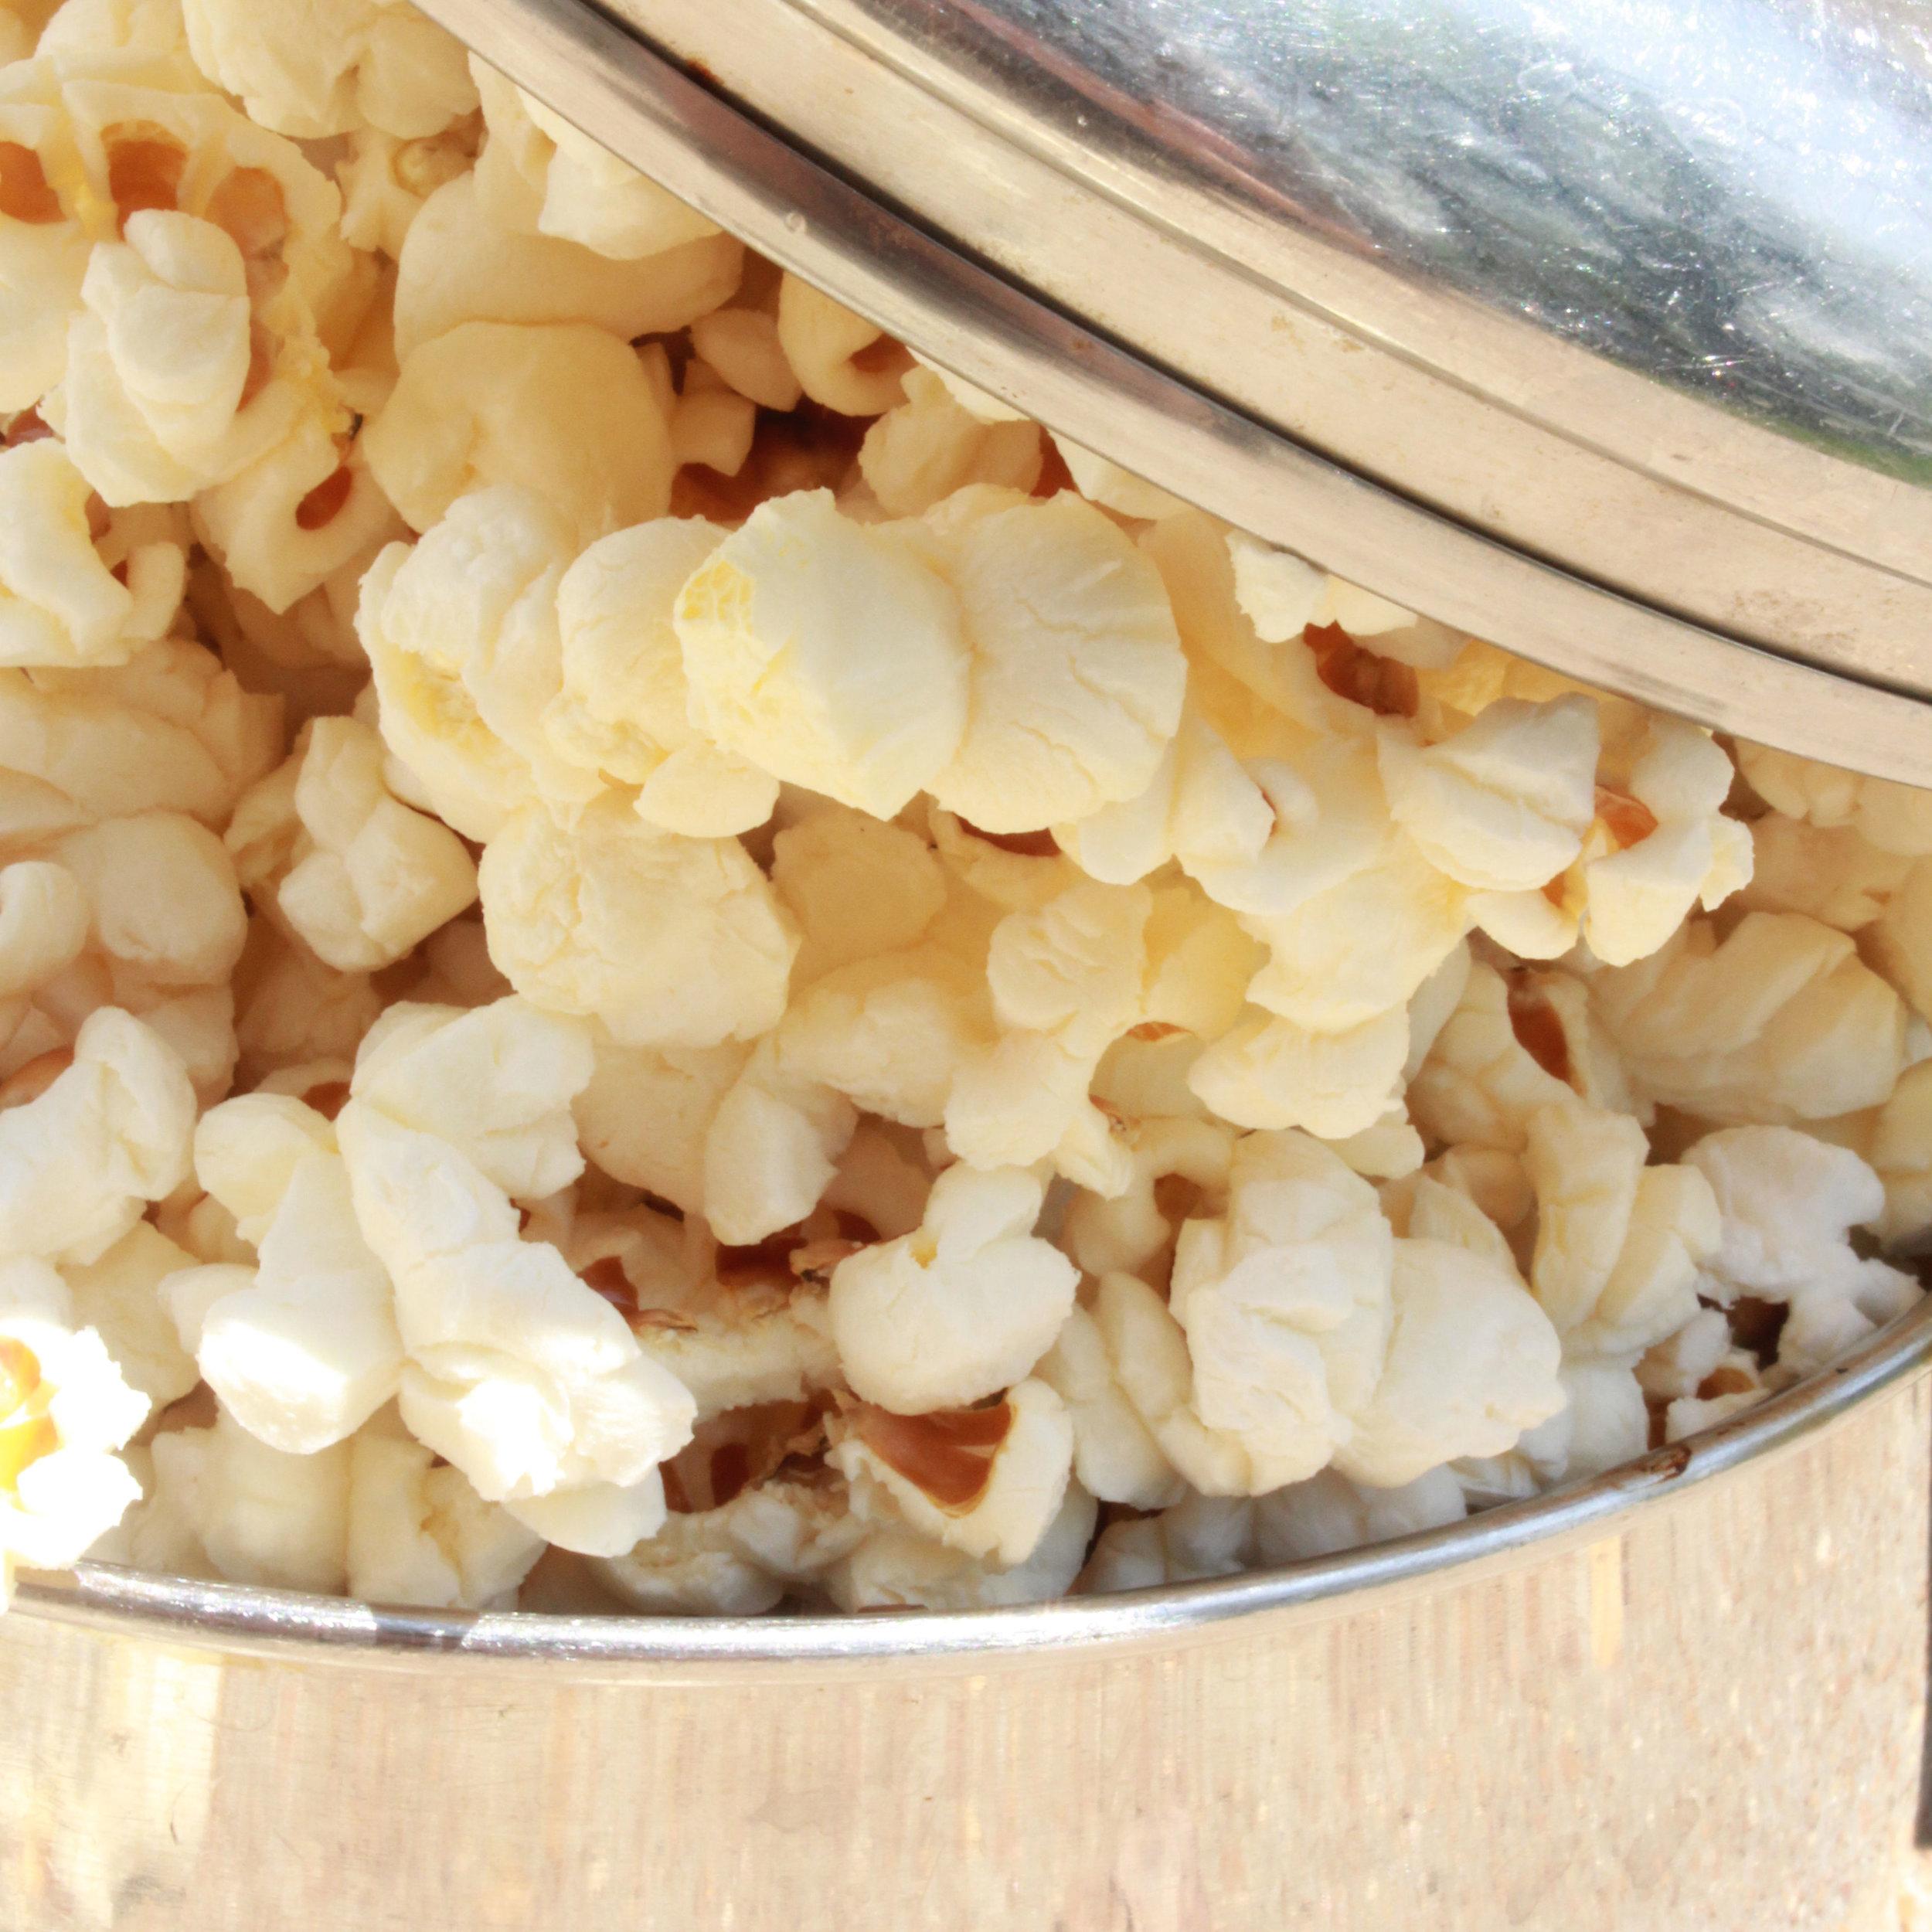 ella-and-ollie-heirloom-popcorn-st-louis-missouri-belleville-illinois-stovetop-square.jpg